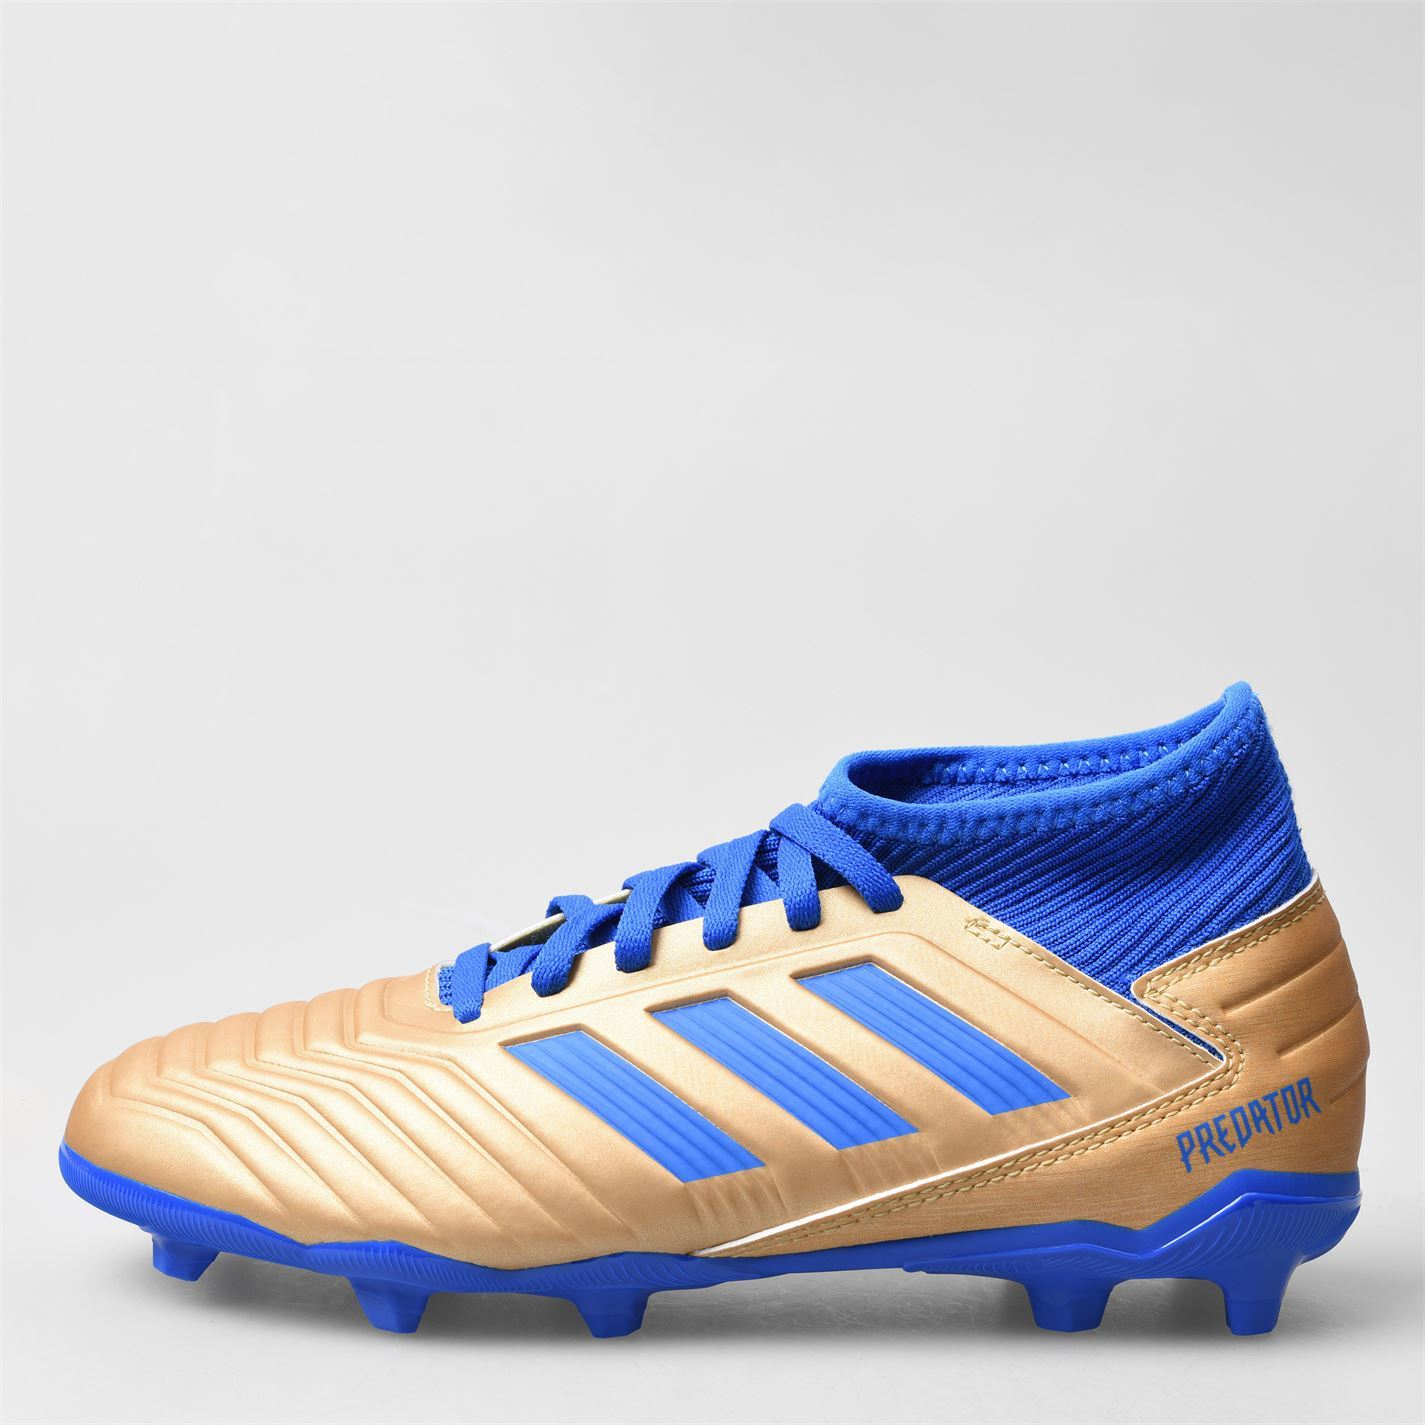 Adidas-Predator-Junior-19-3-FG-Firm-Ground-football-boots-Boys-Football-Chaussures miniature 8